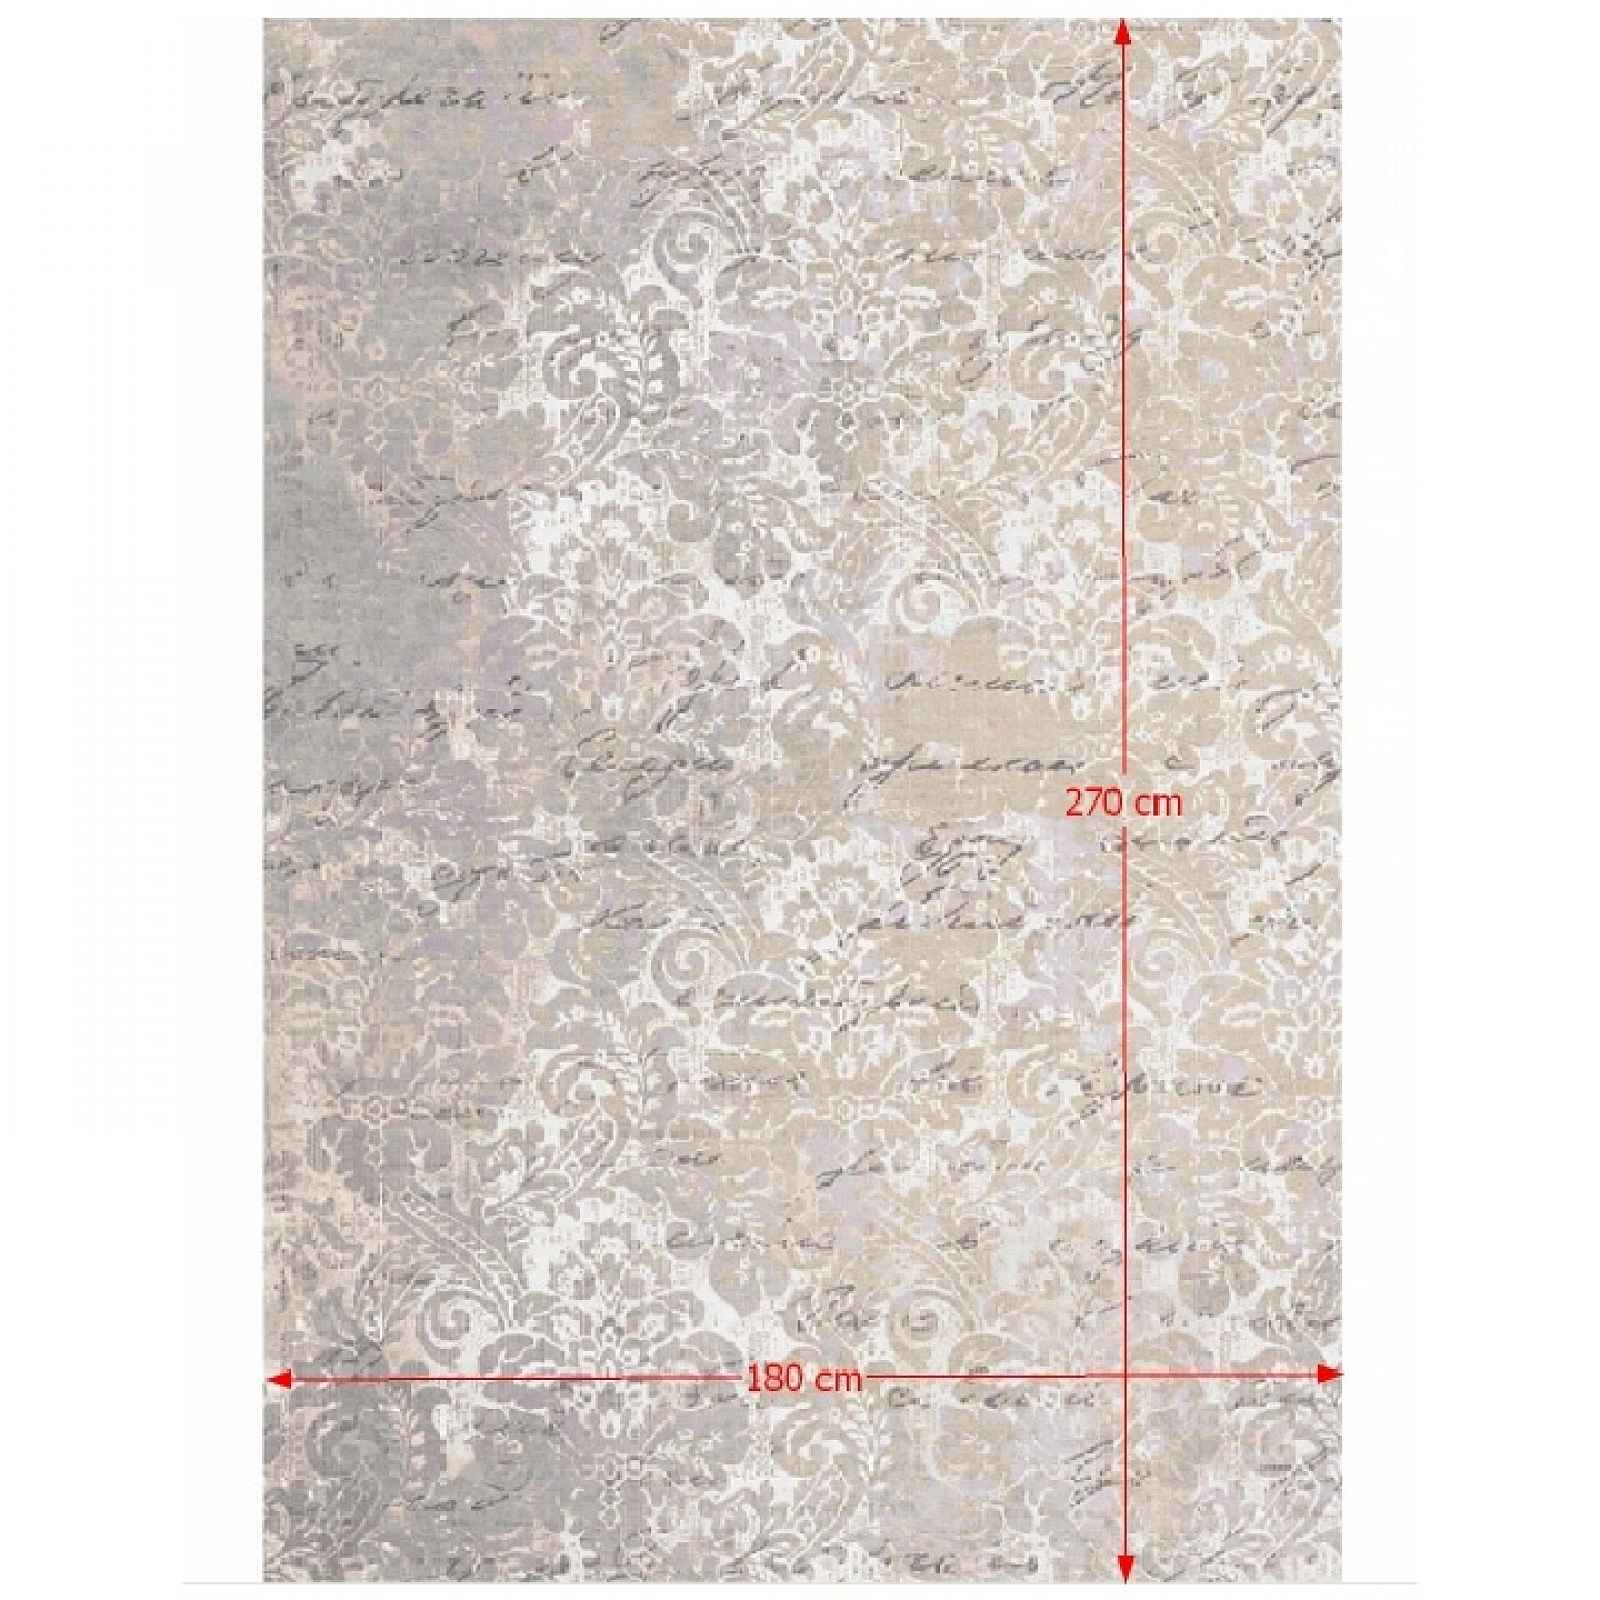 Koberec s třásněmi BALIN béžová / vzor Tempo Kondela 180x270 cm